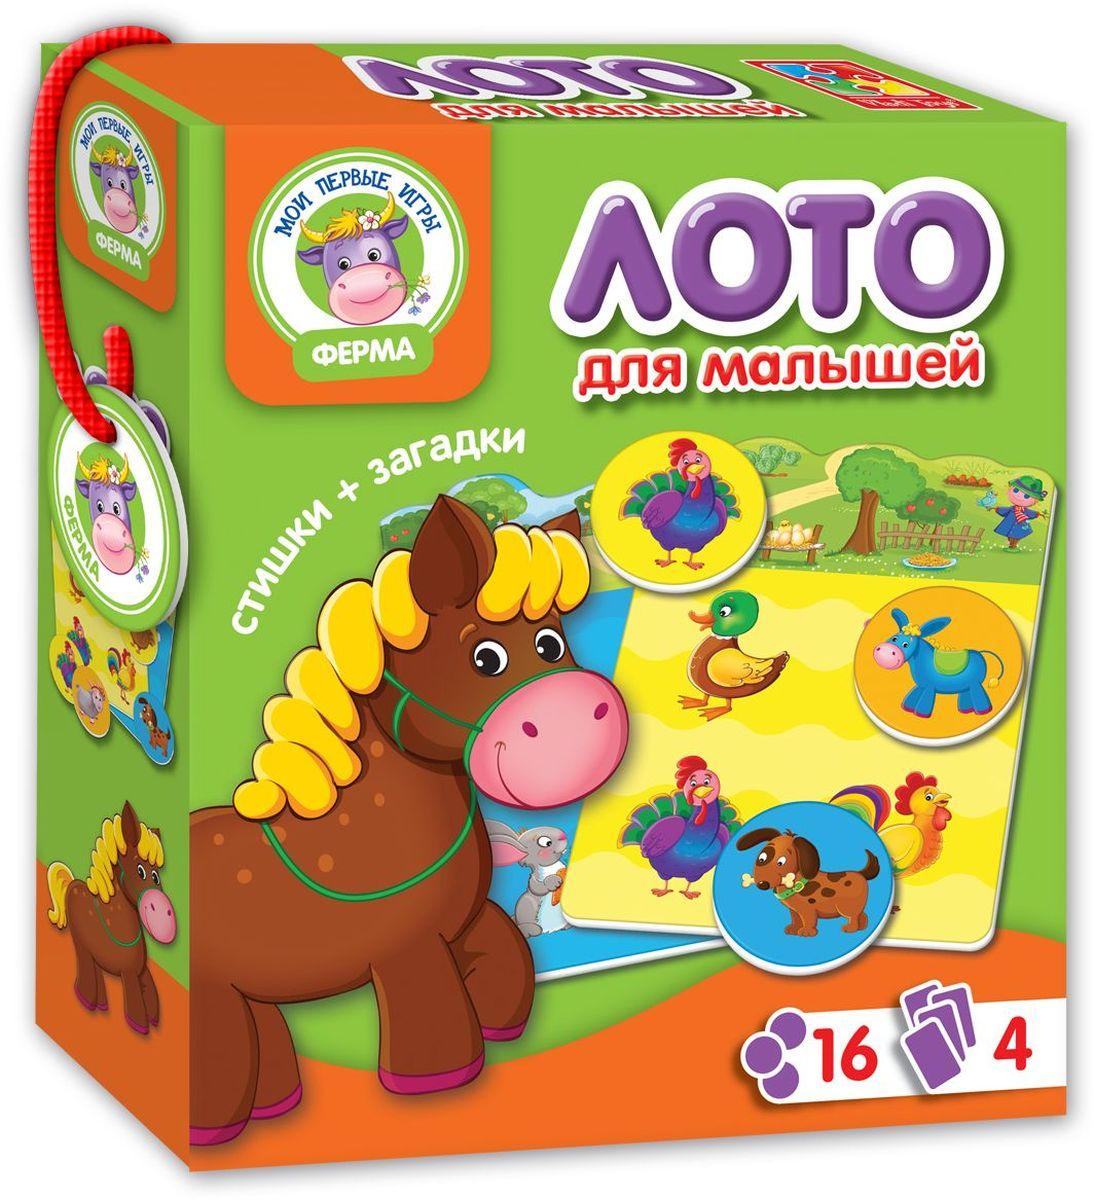 Vladi Toys Игра настольная Ферма Лото brainbox brainbox игра сундучок знаний россия